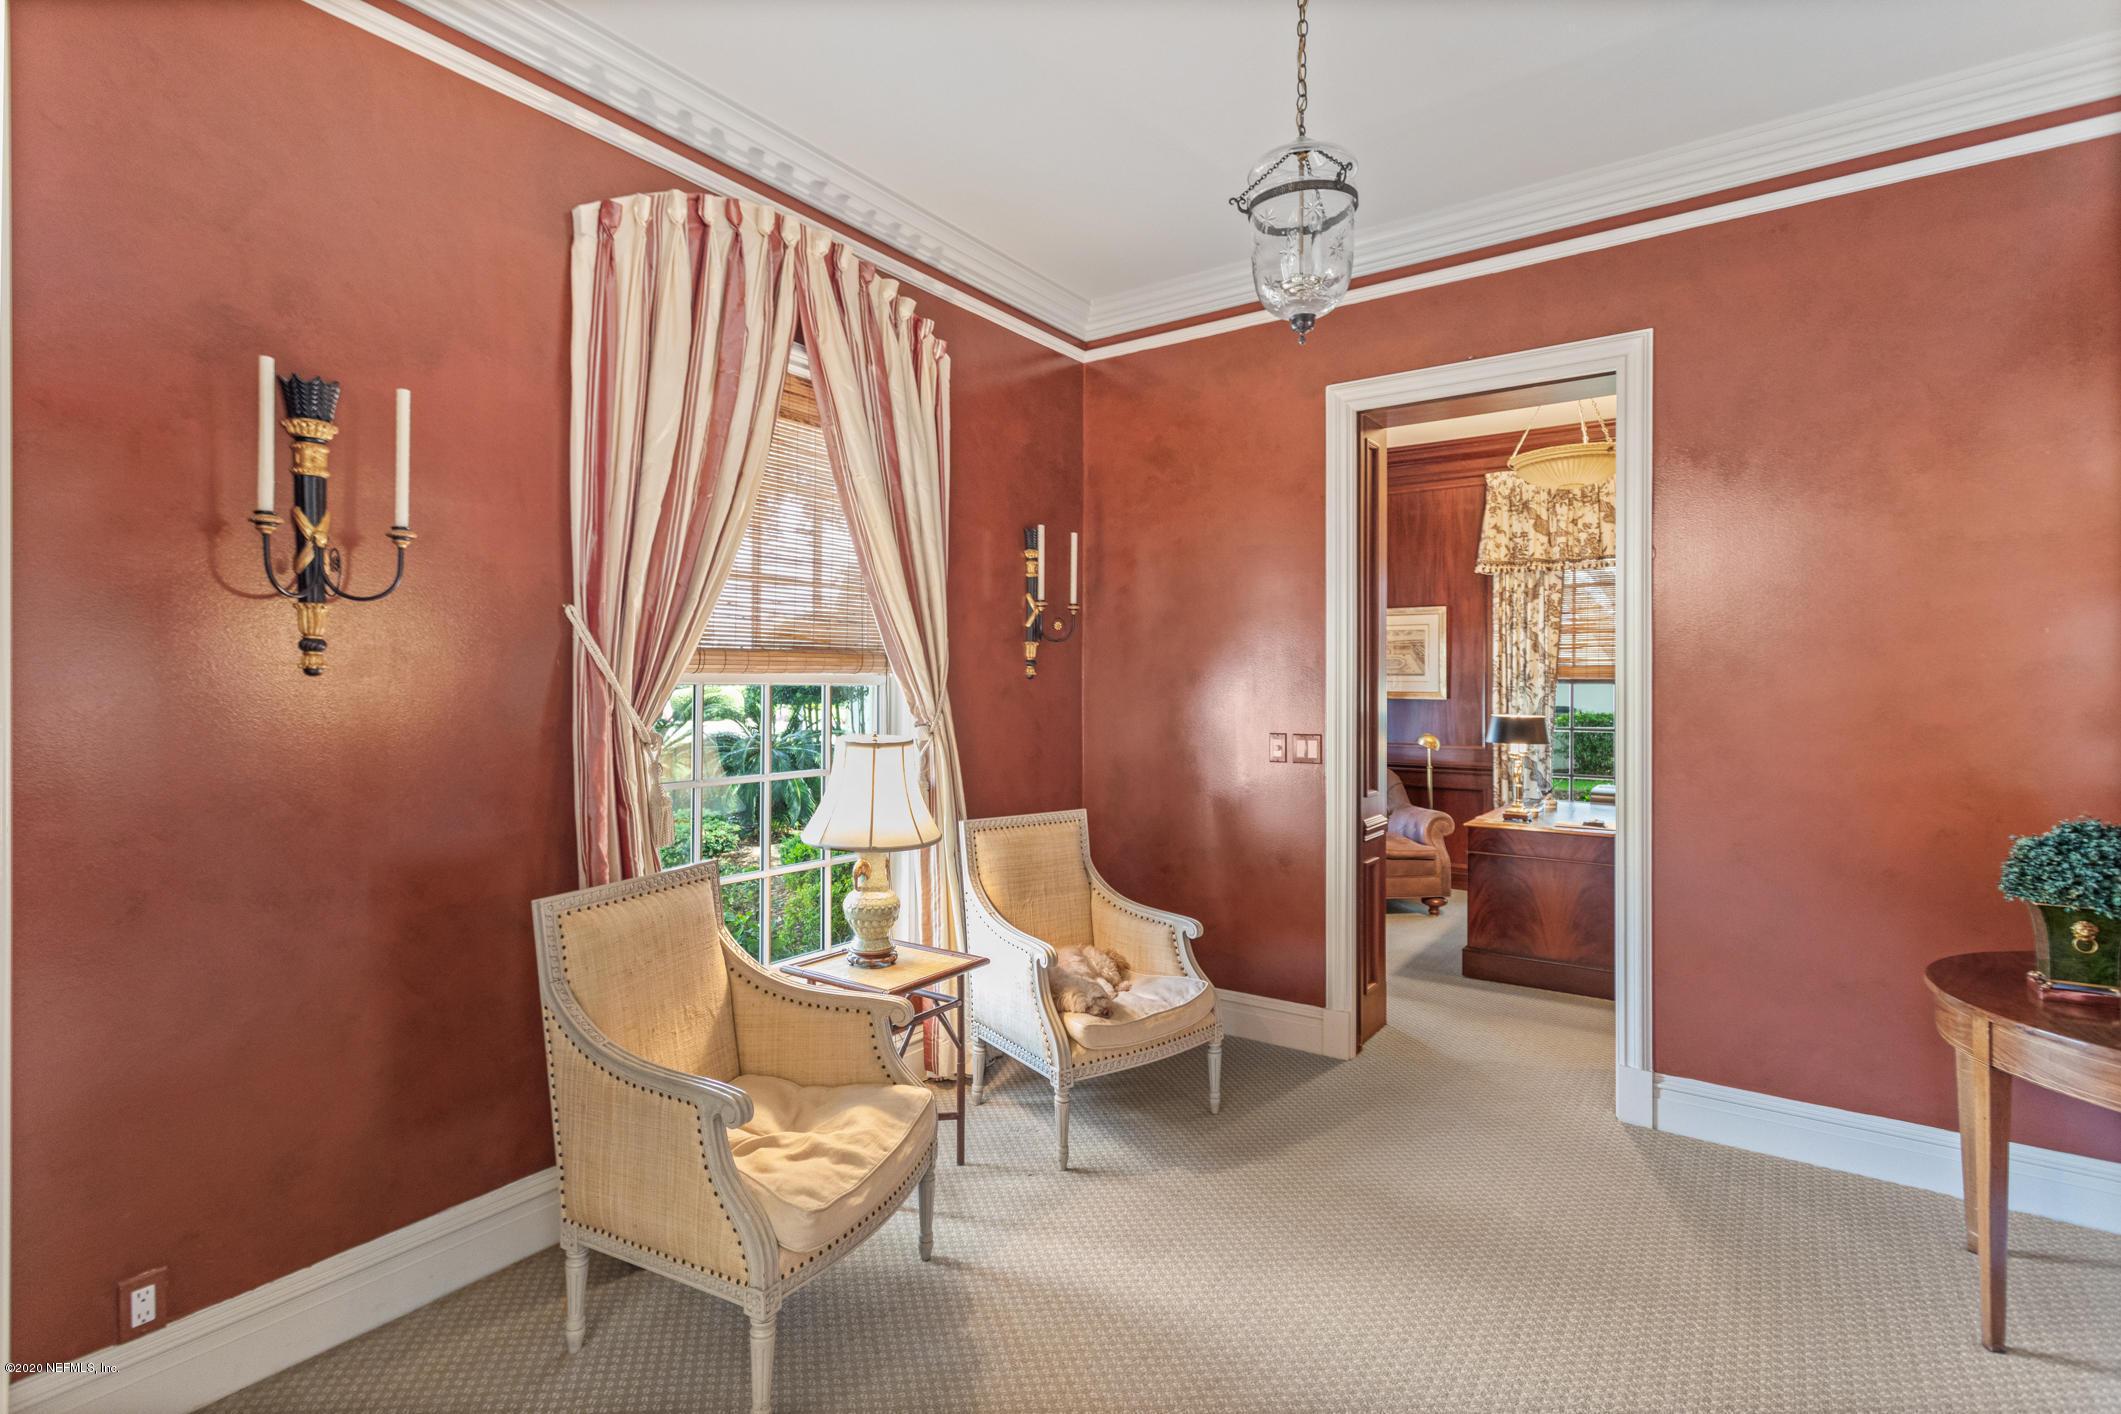 121 SEA ISLAND, PONTE VEDRA BEACH, FLORIDA 32082, 4 Bedrooms Bedrooms, ,3 BathroomsBathrooms,Residential,For sale,SEA ISLAND,1053032